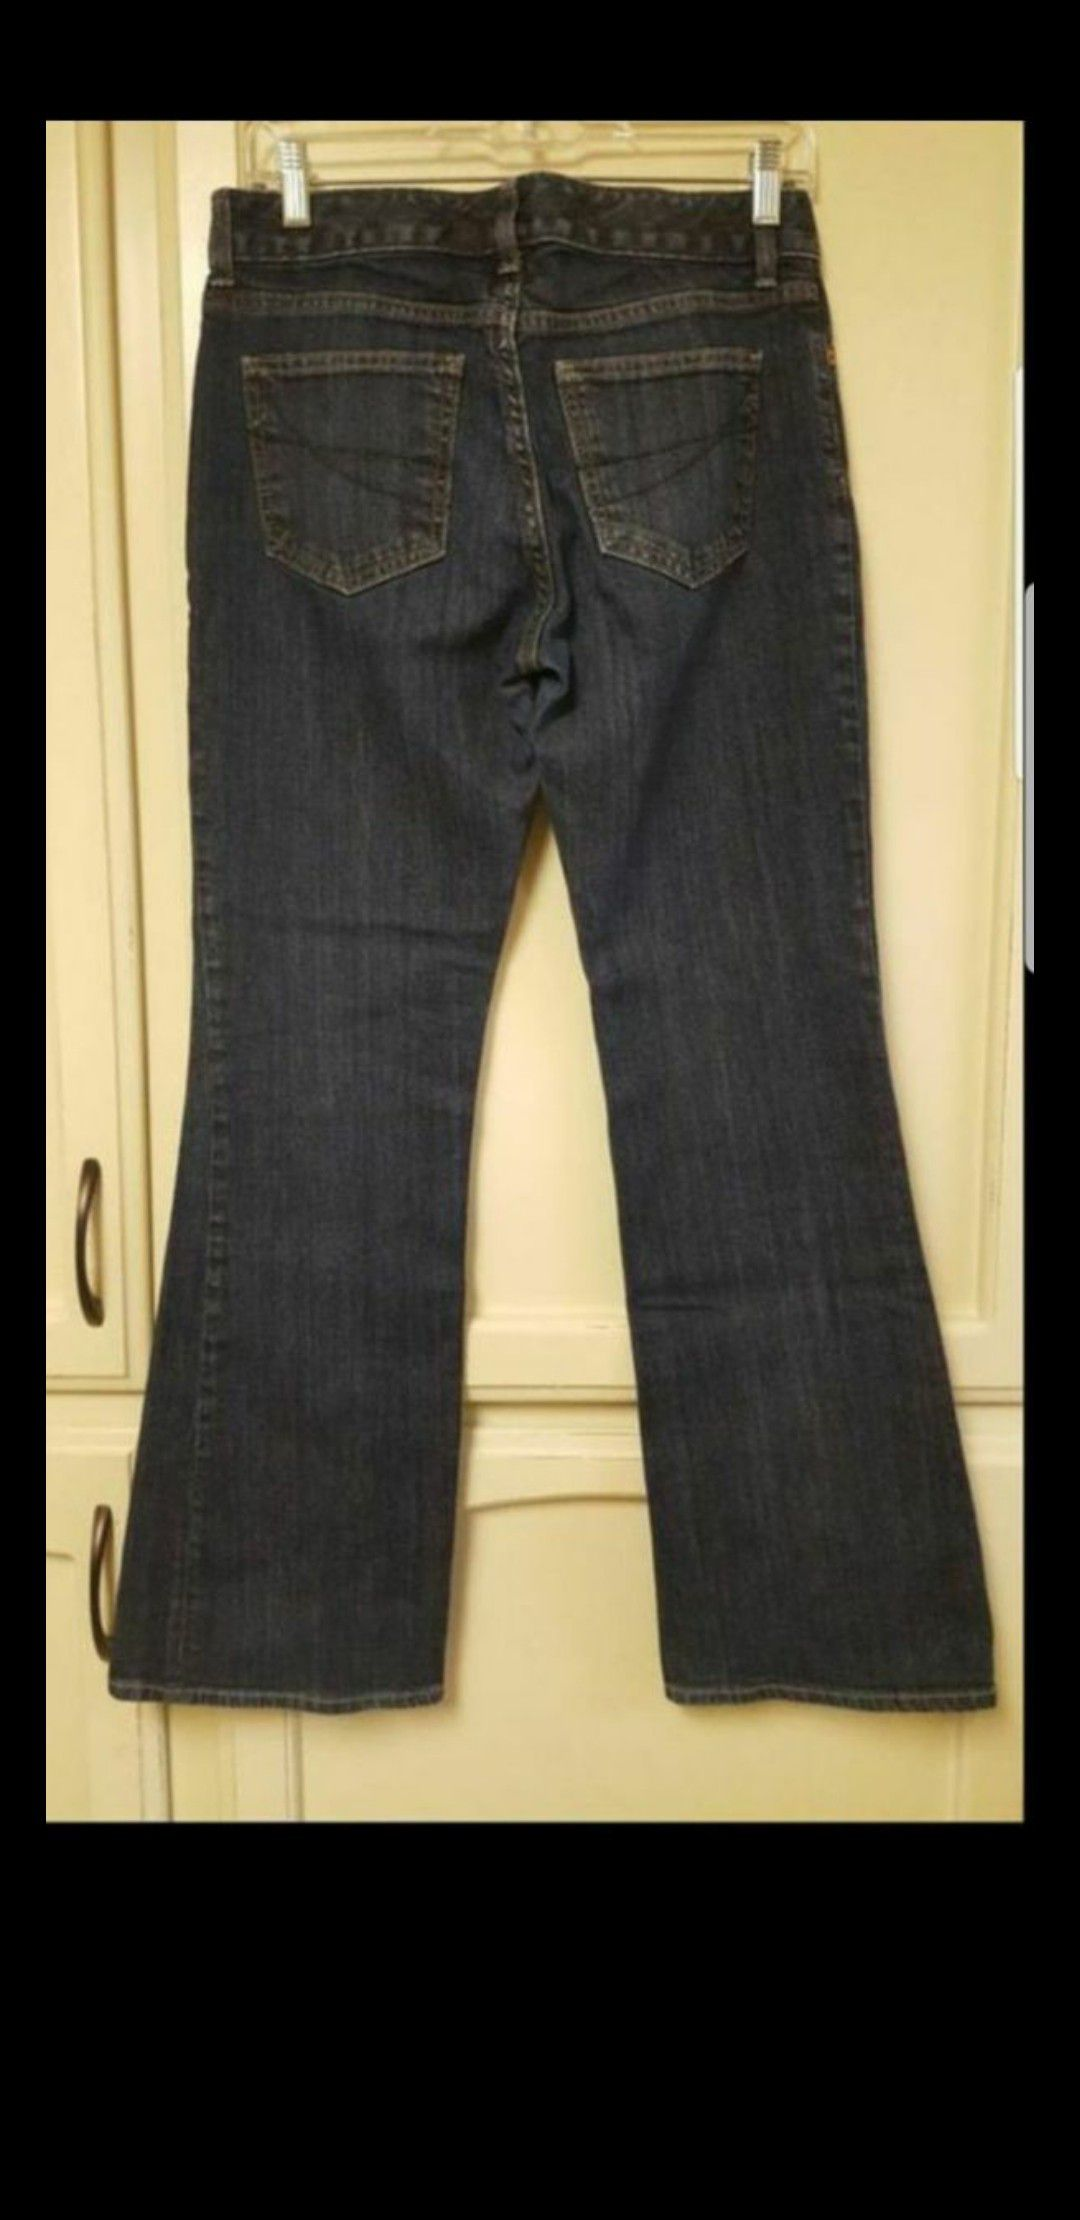 Jeans GAP Women's Curvy Low Rise Size 8